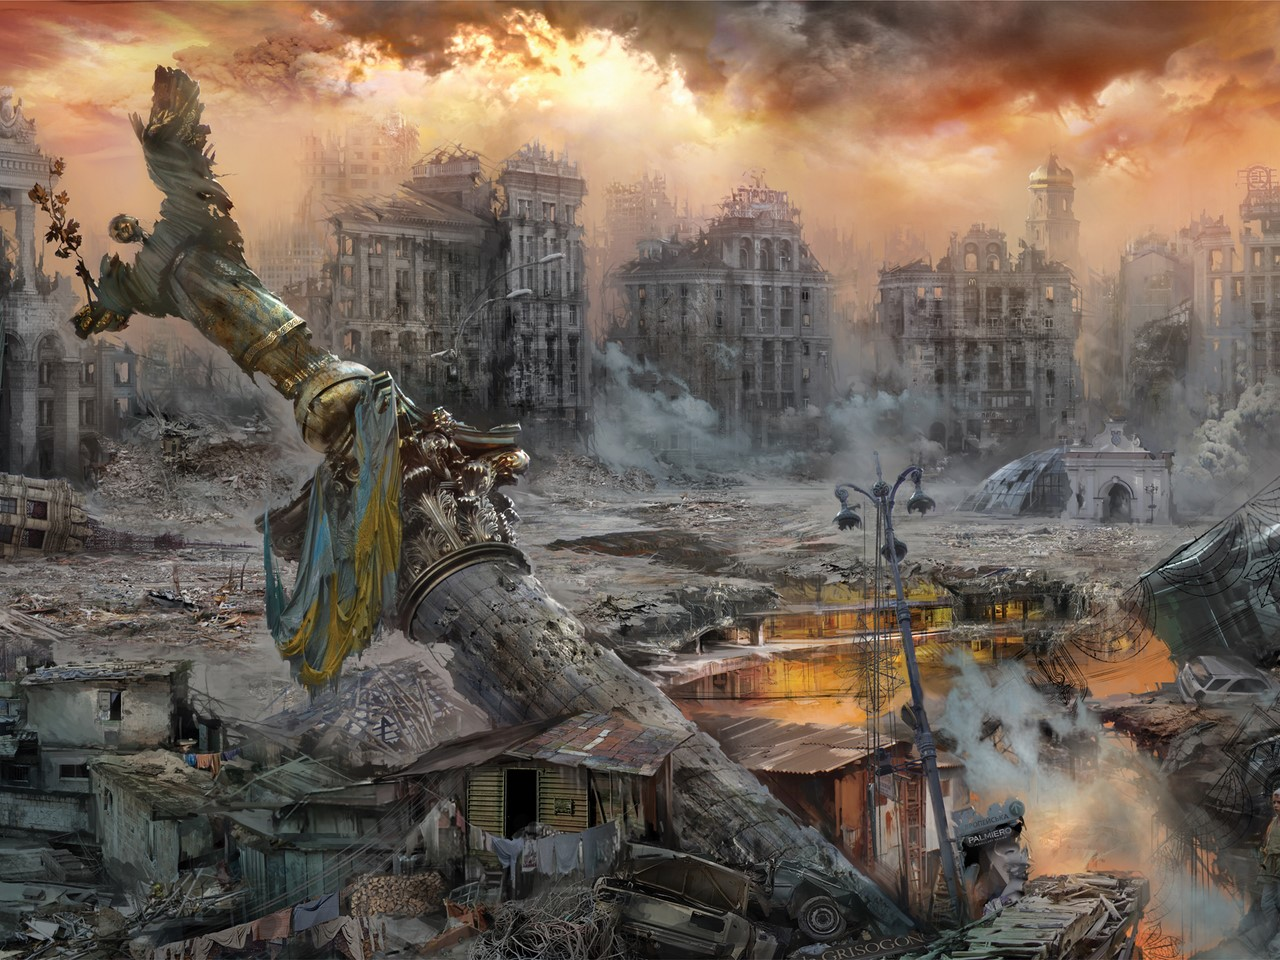 Апокалипсис в Киеве - Мастерок.жж.рф - photo#39